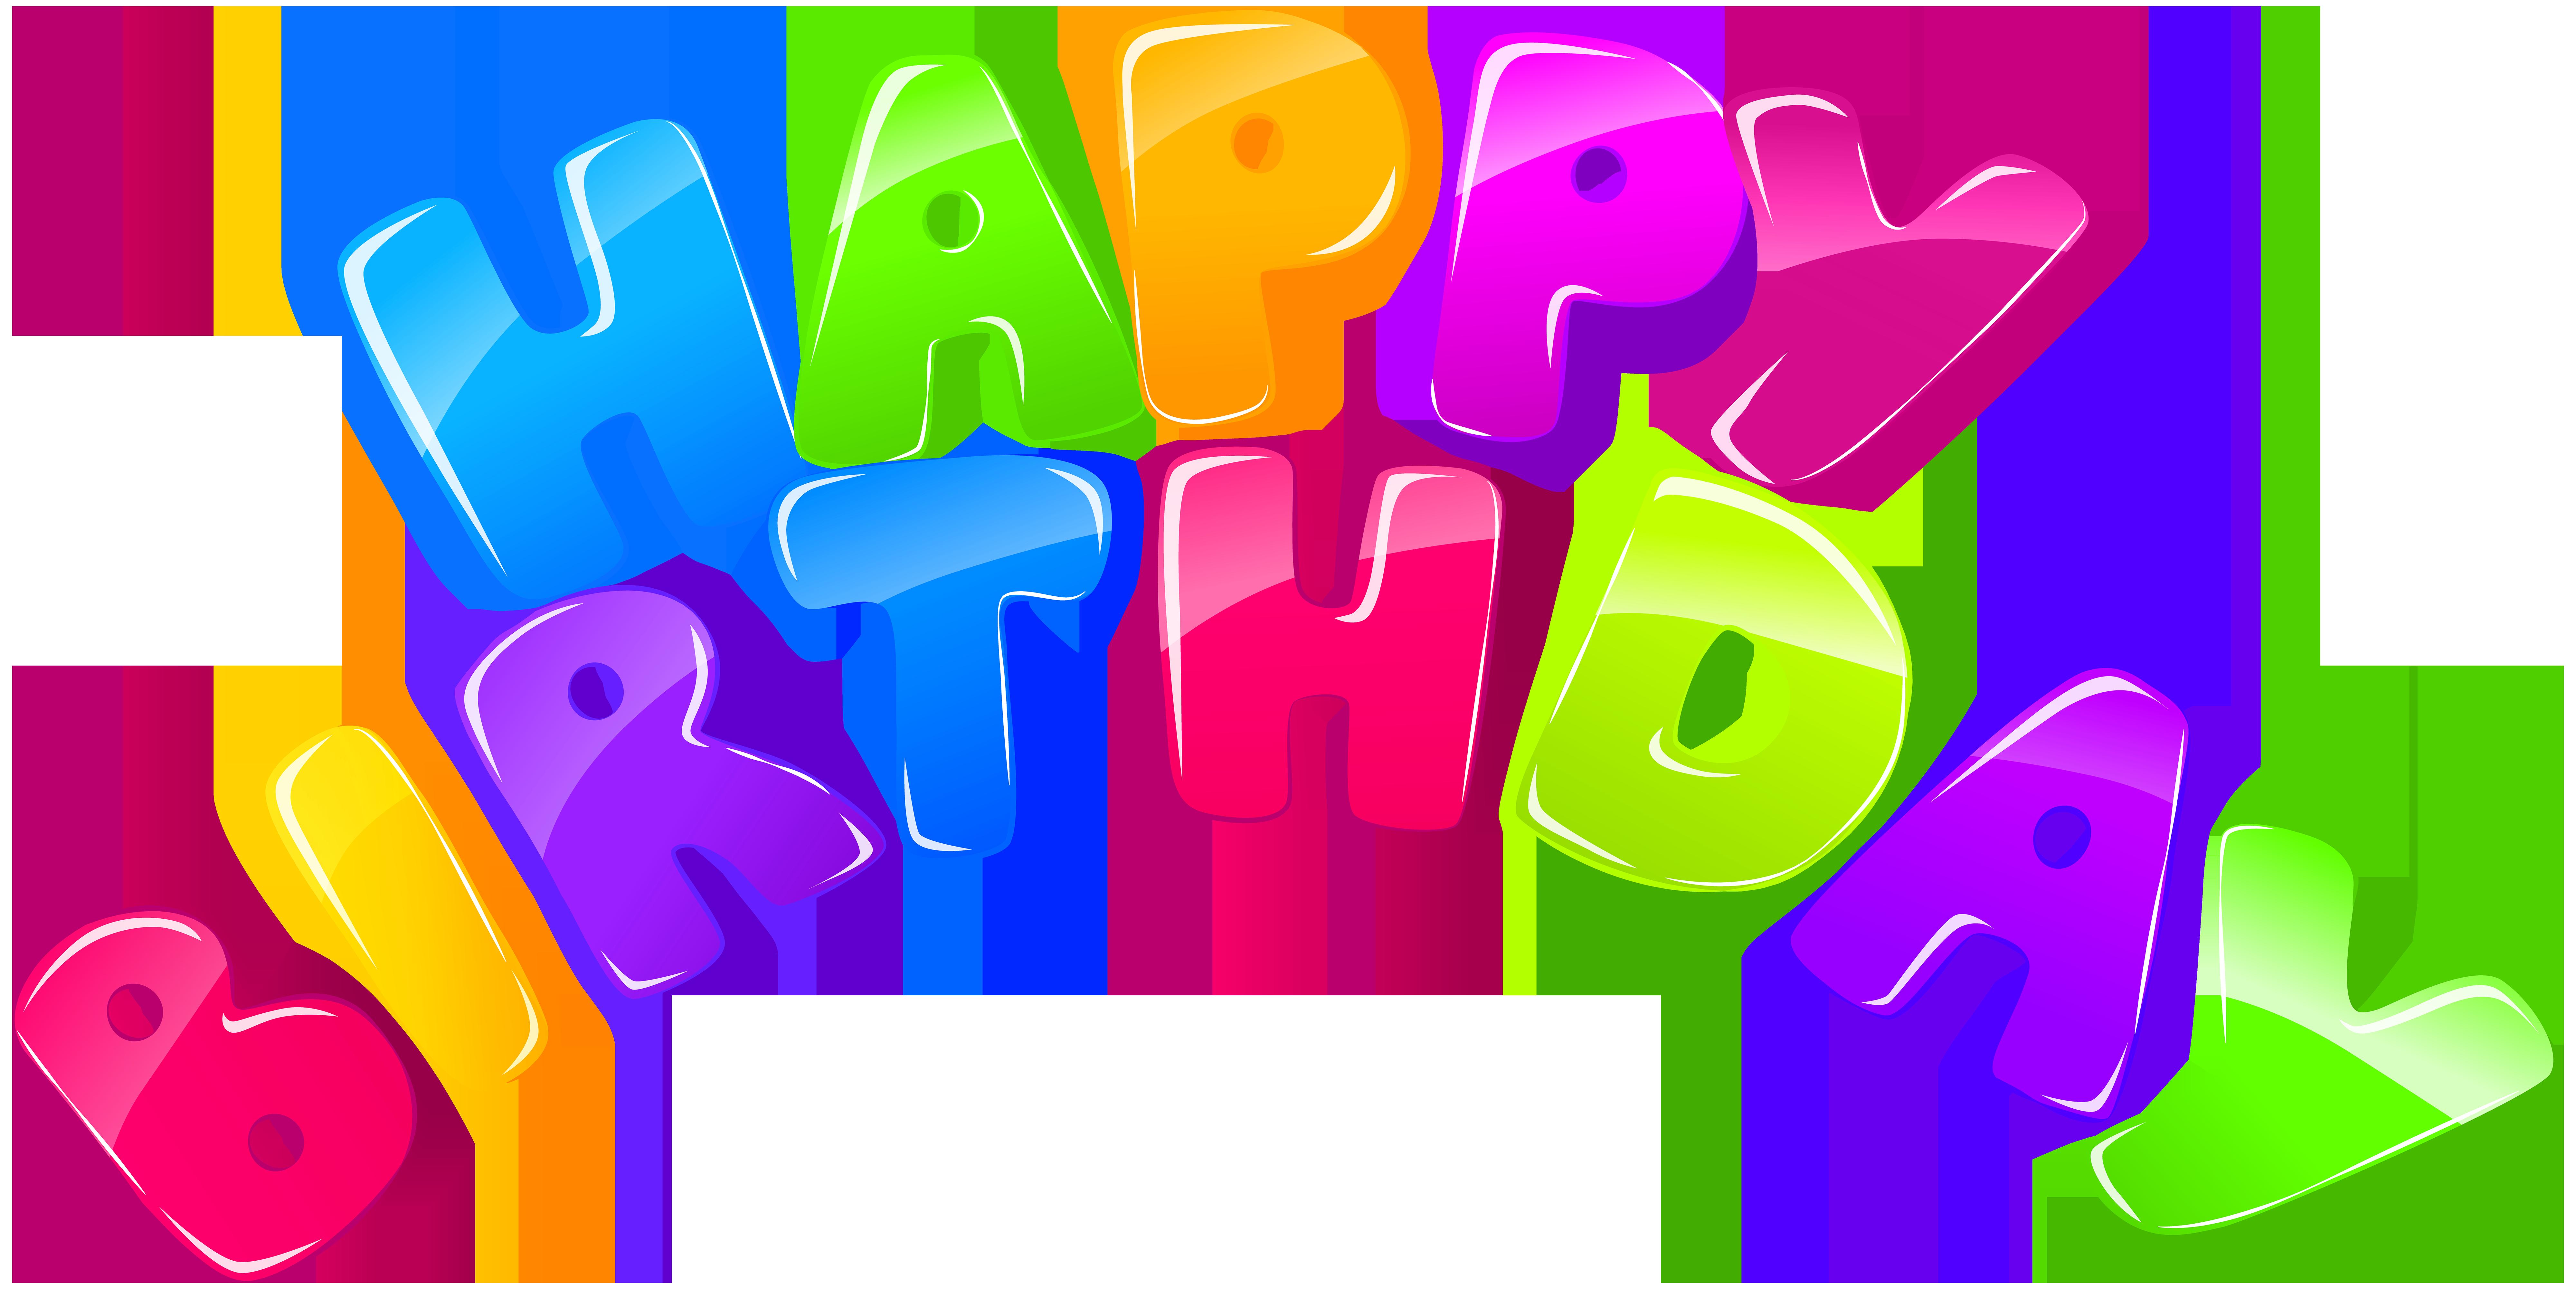 Spring happy birthday clipart vector royalty free stock Clipart spring birthday, Clipart spring birthday Transparent ... vector royalty free stock